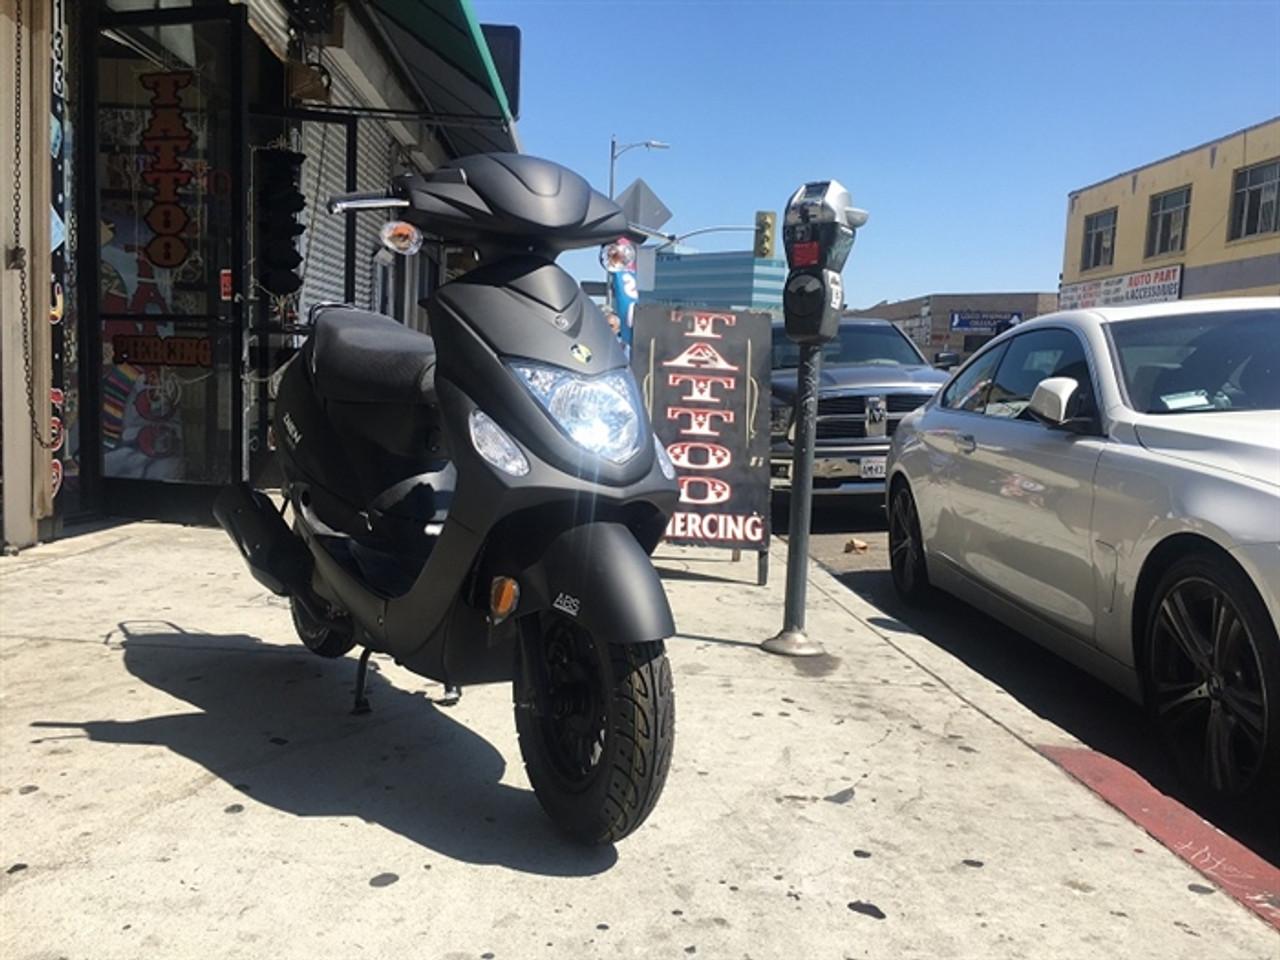 Amigo Znen 2017 SUN3-50 49cc Street Legal Scooter, 3.0 HP 4 stroke SOHC Air Cooled